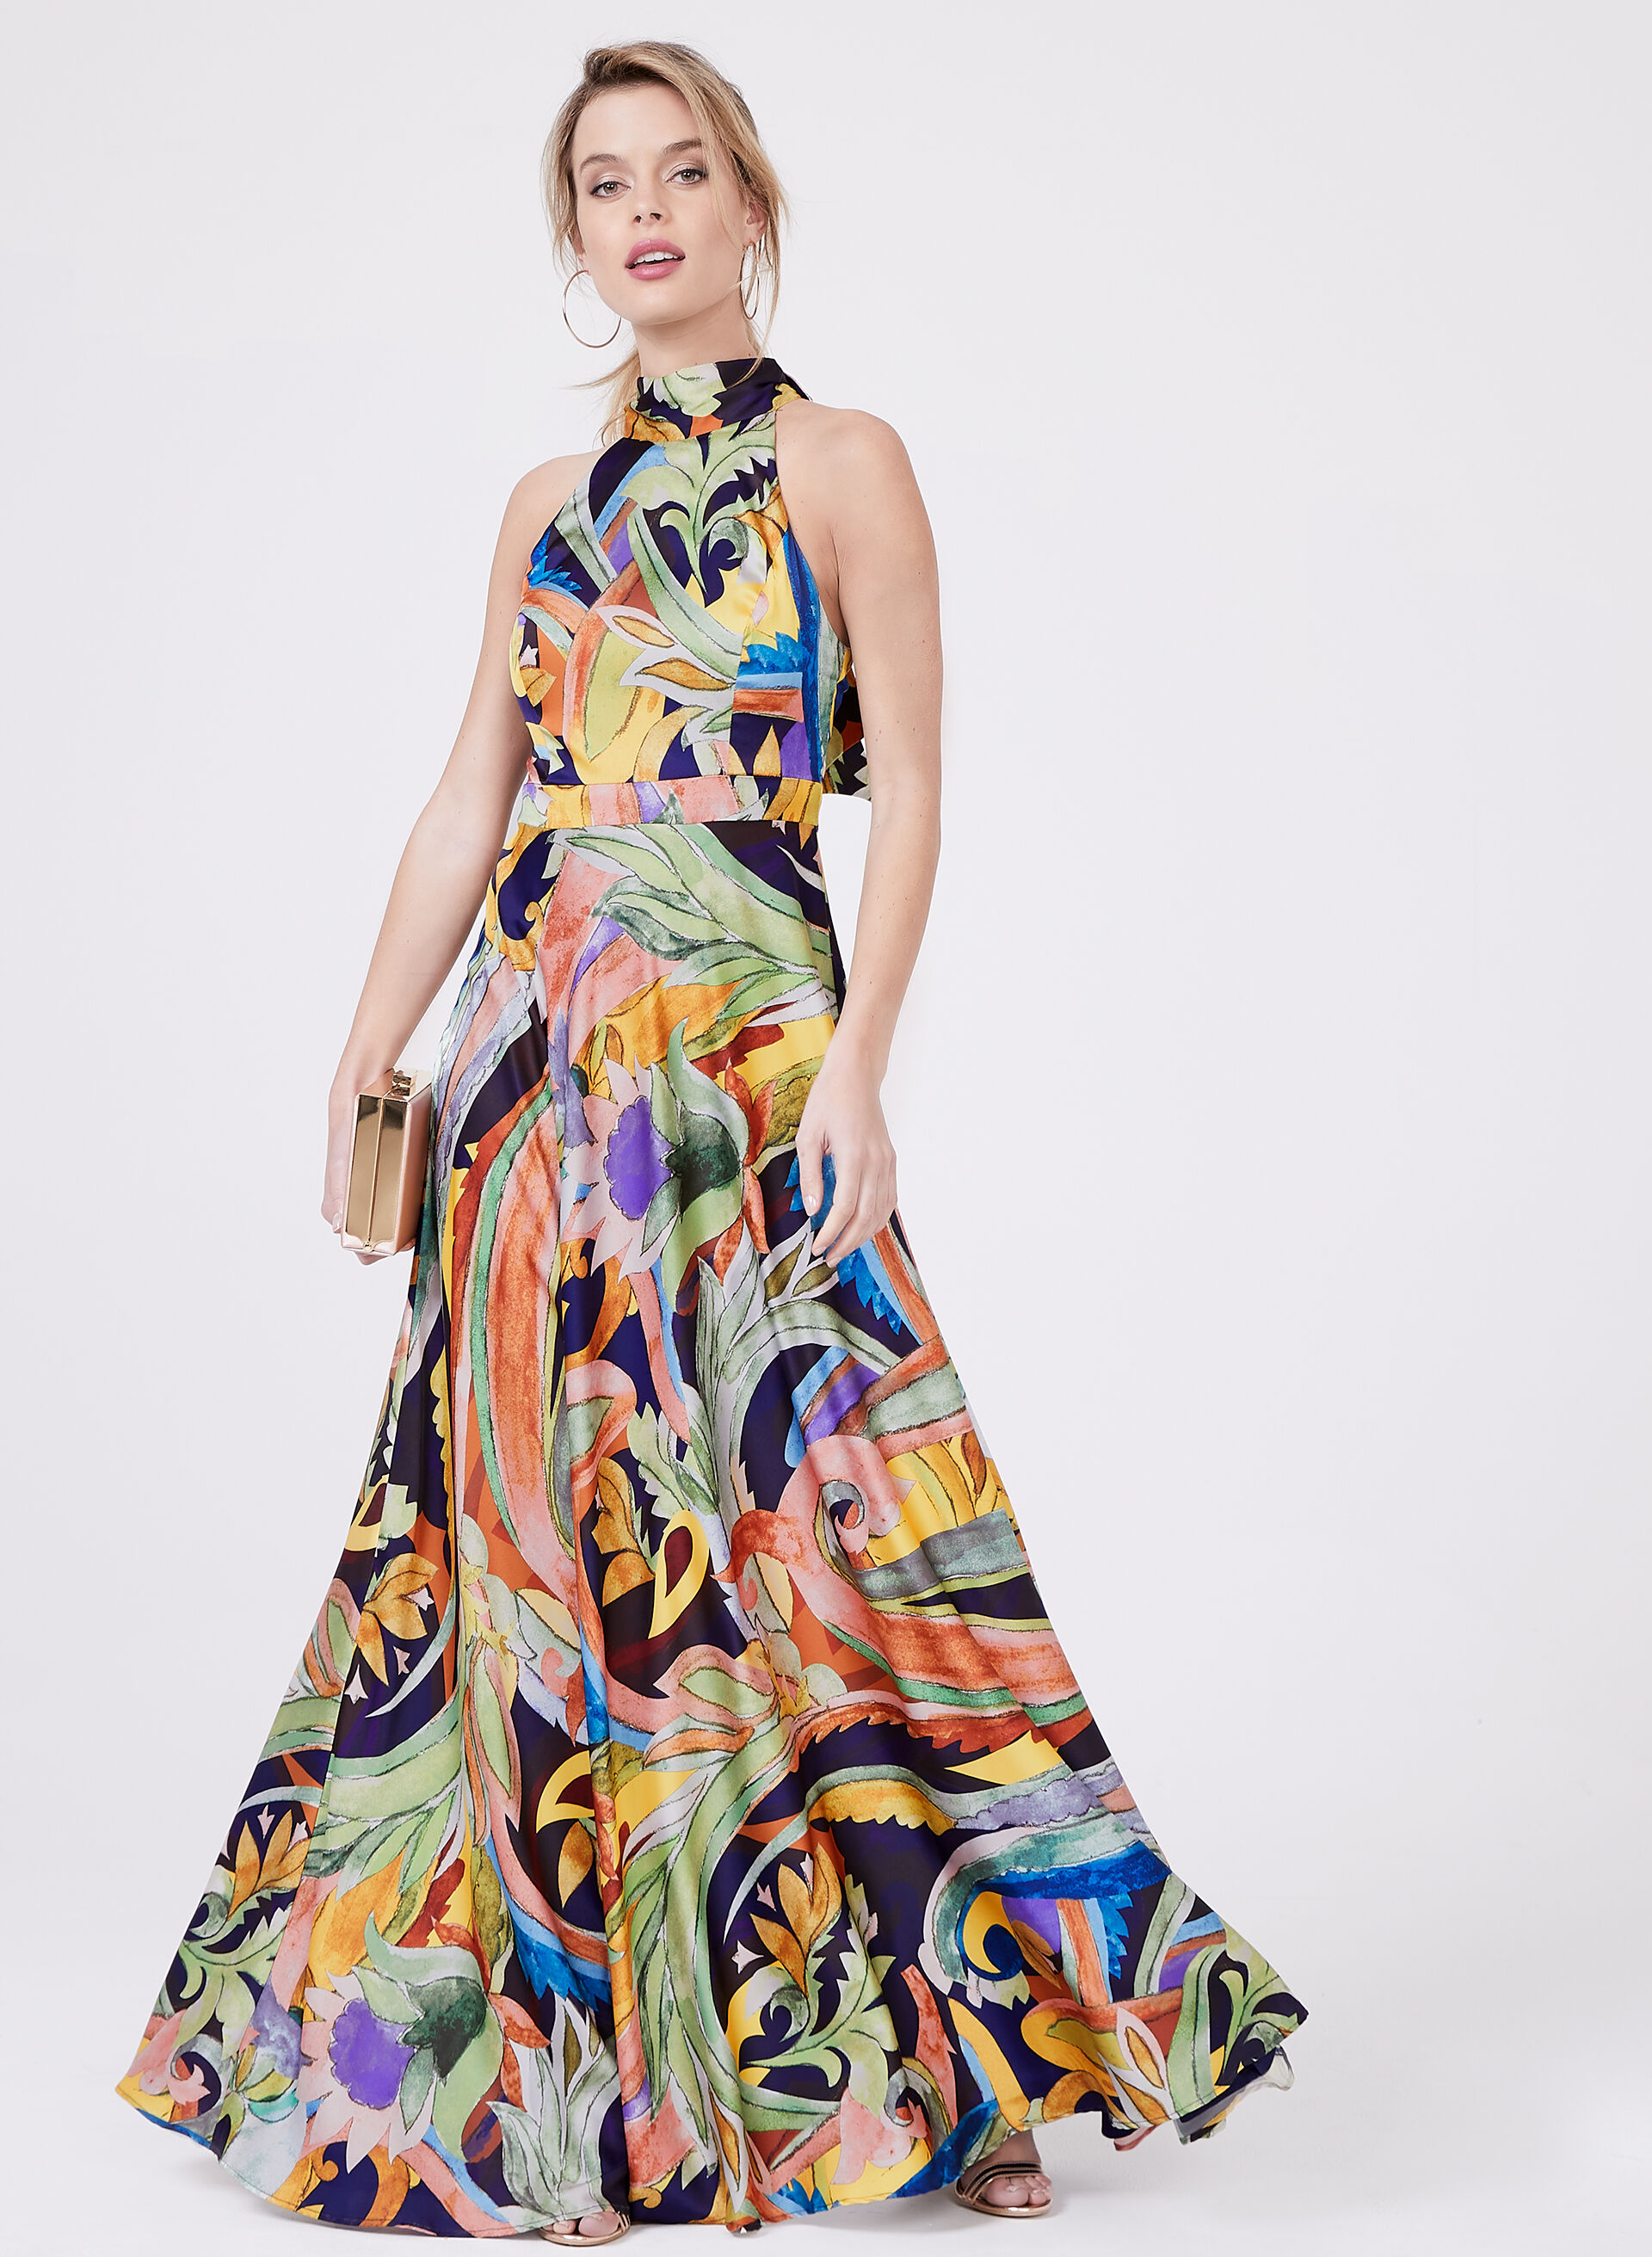 ... Nicole Miller - Abstract Print Halter Maxi Dress, Multi, hi-res. best  seller